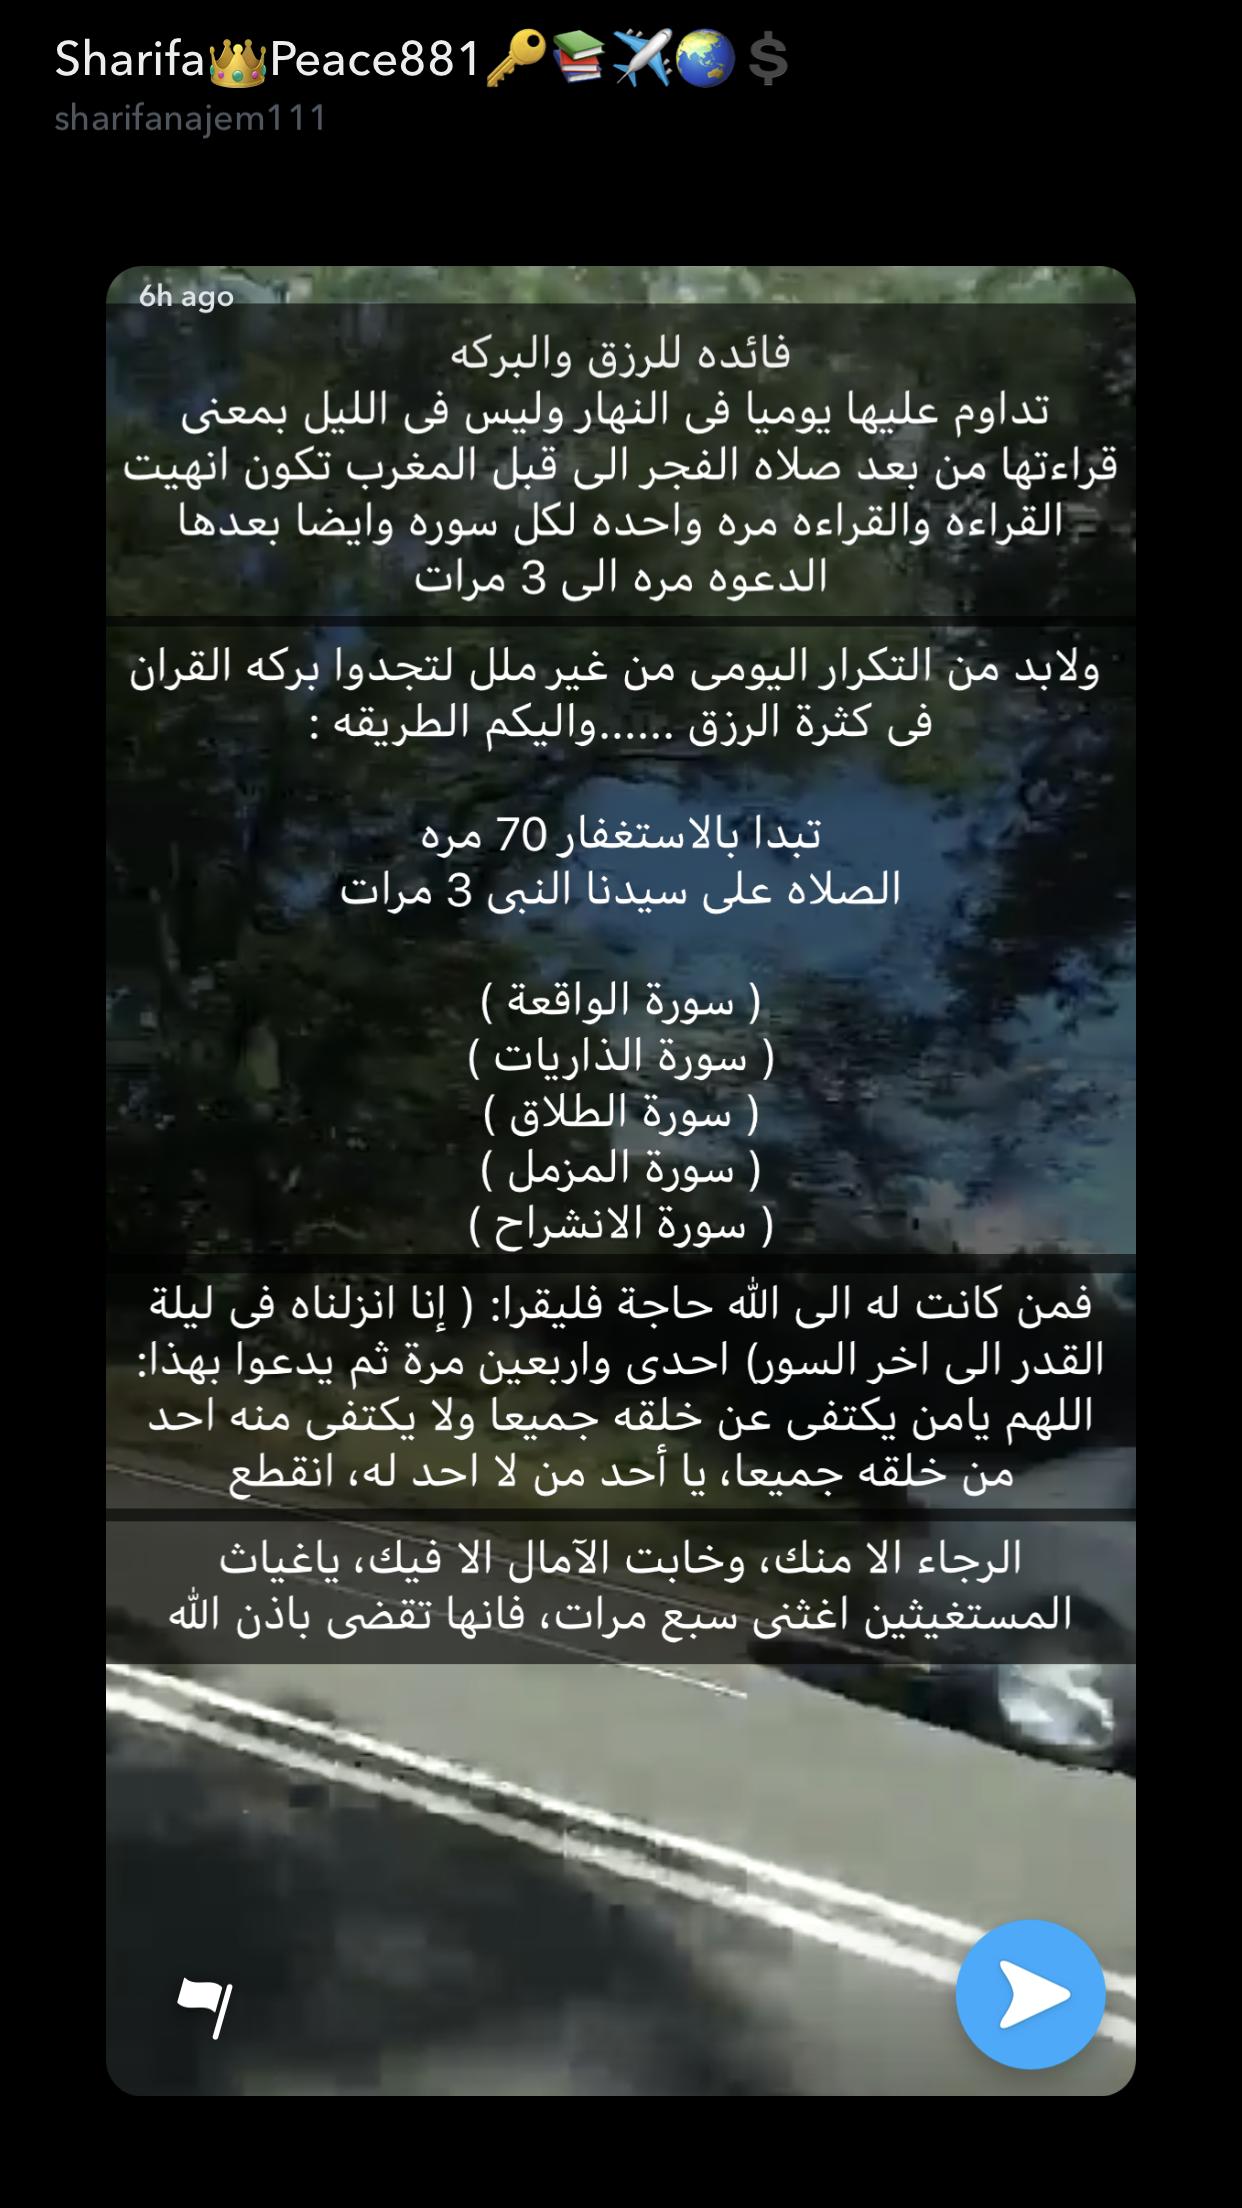 Pin By Awatif75 639 On Dou3a Islam Facts Islamic Phrases Islamic Teachings